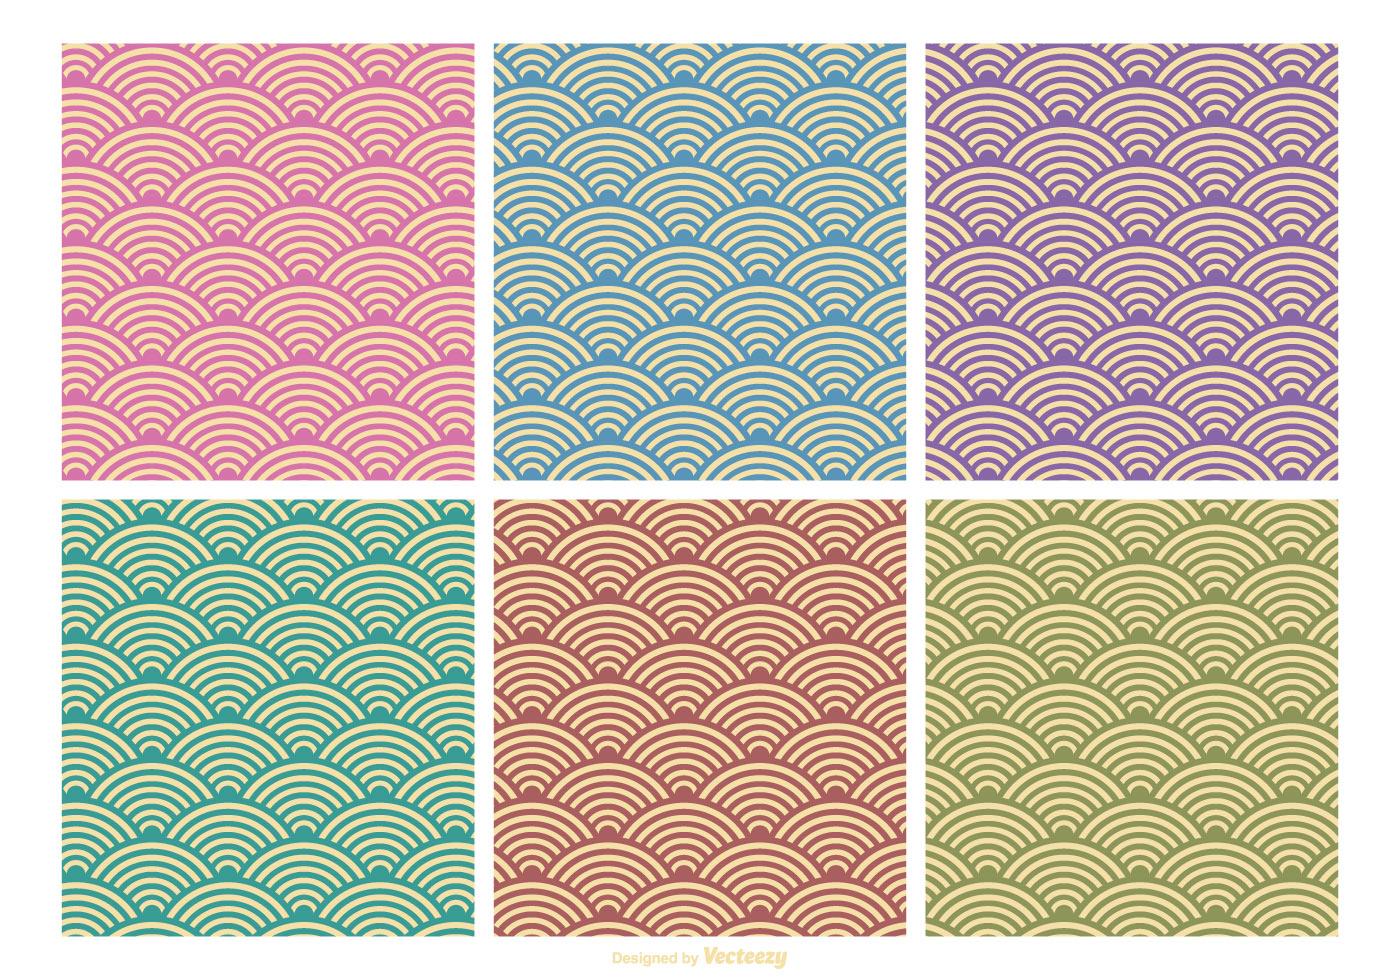 Cute Circle Wallpaper Retro Pattern Vector Set Download Free Vector Art Stock